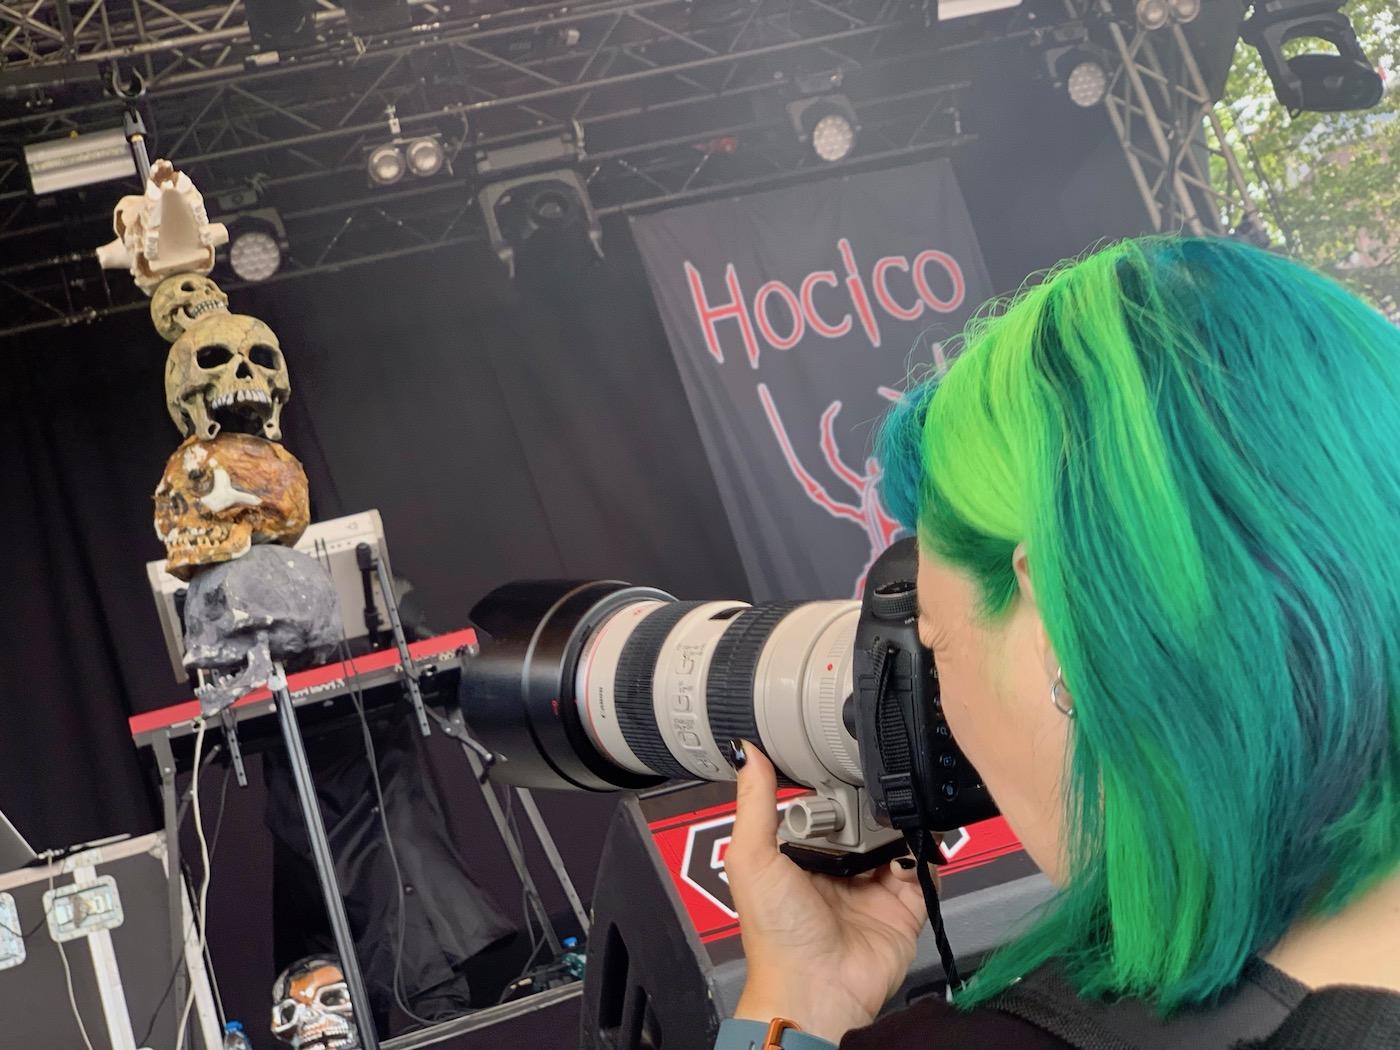 mark_benecke_amphi_festival_koeln_2019 - 44.jpg